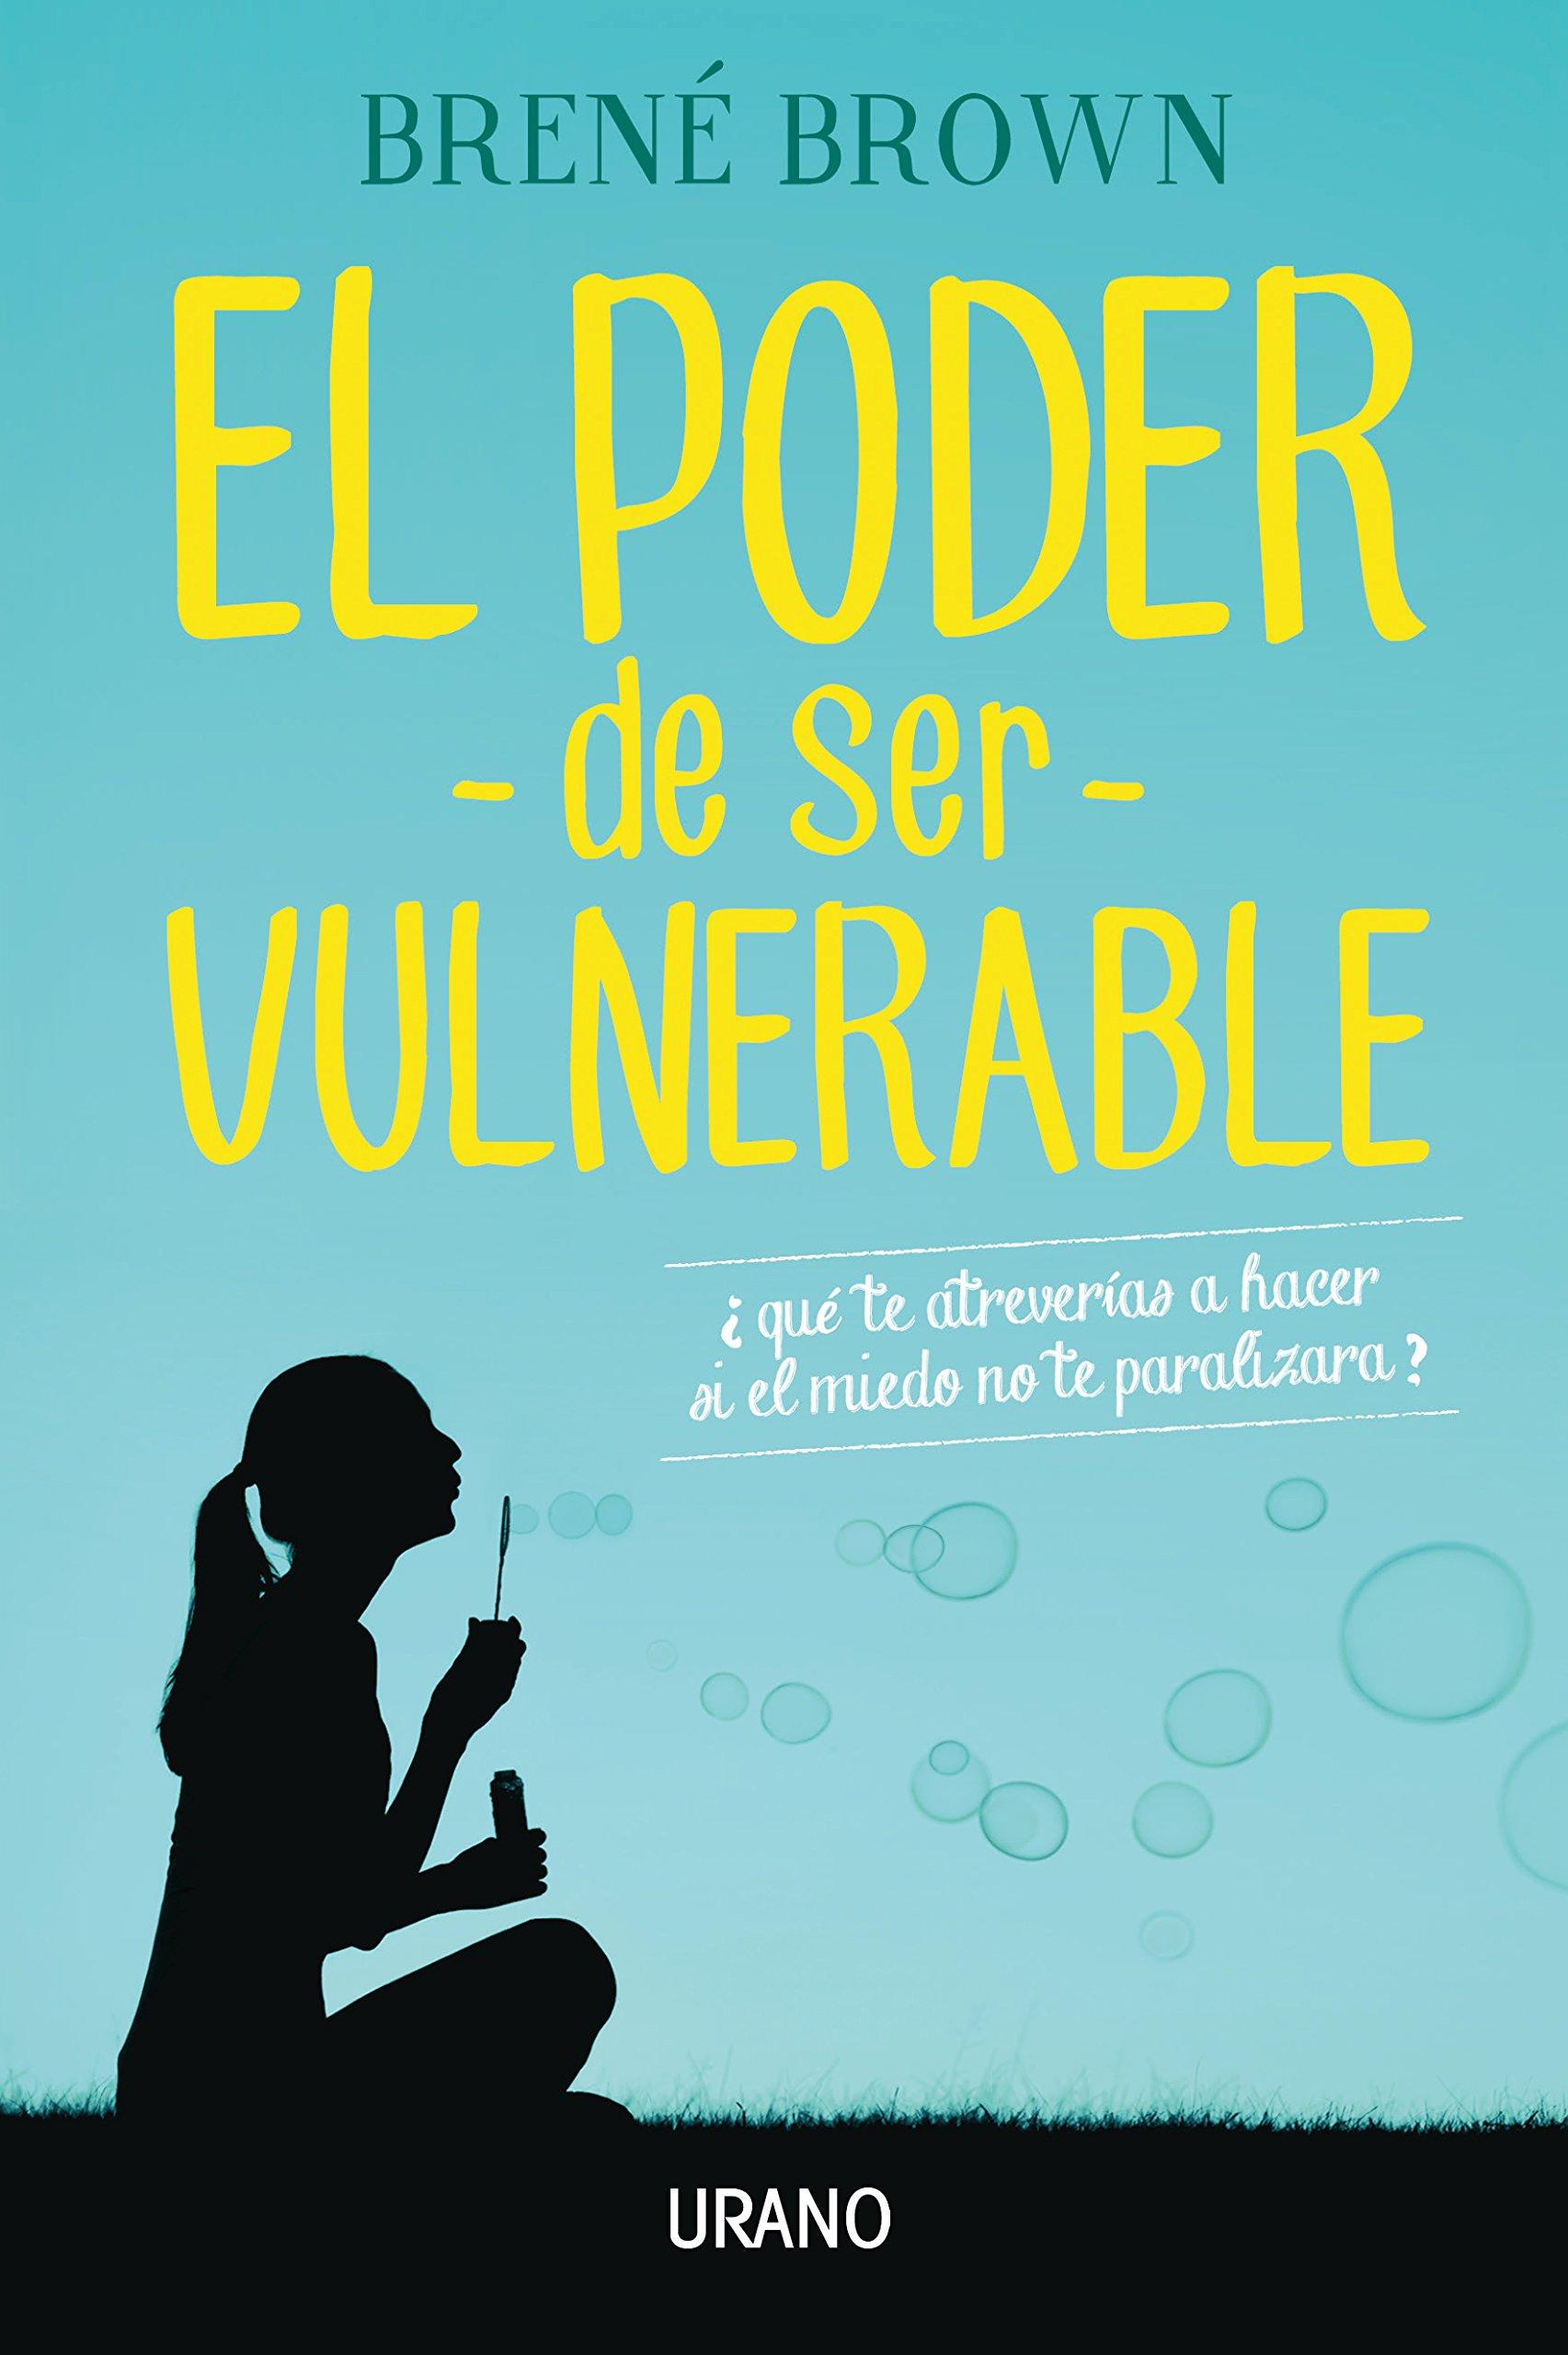 El poder de ser vulnerable (Spanish Edition): Brene Brown: 9788479539498:  Amazon.com: Books